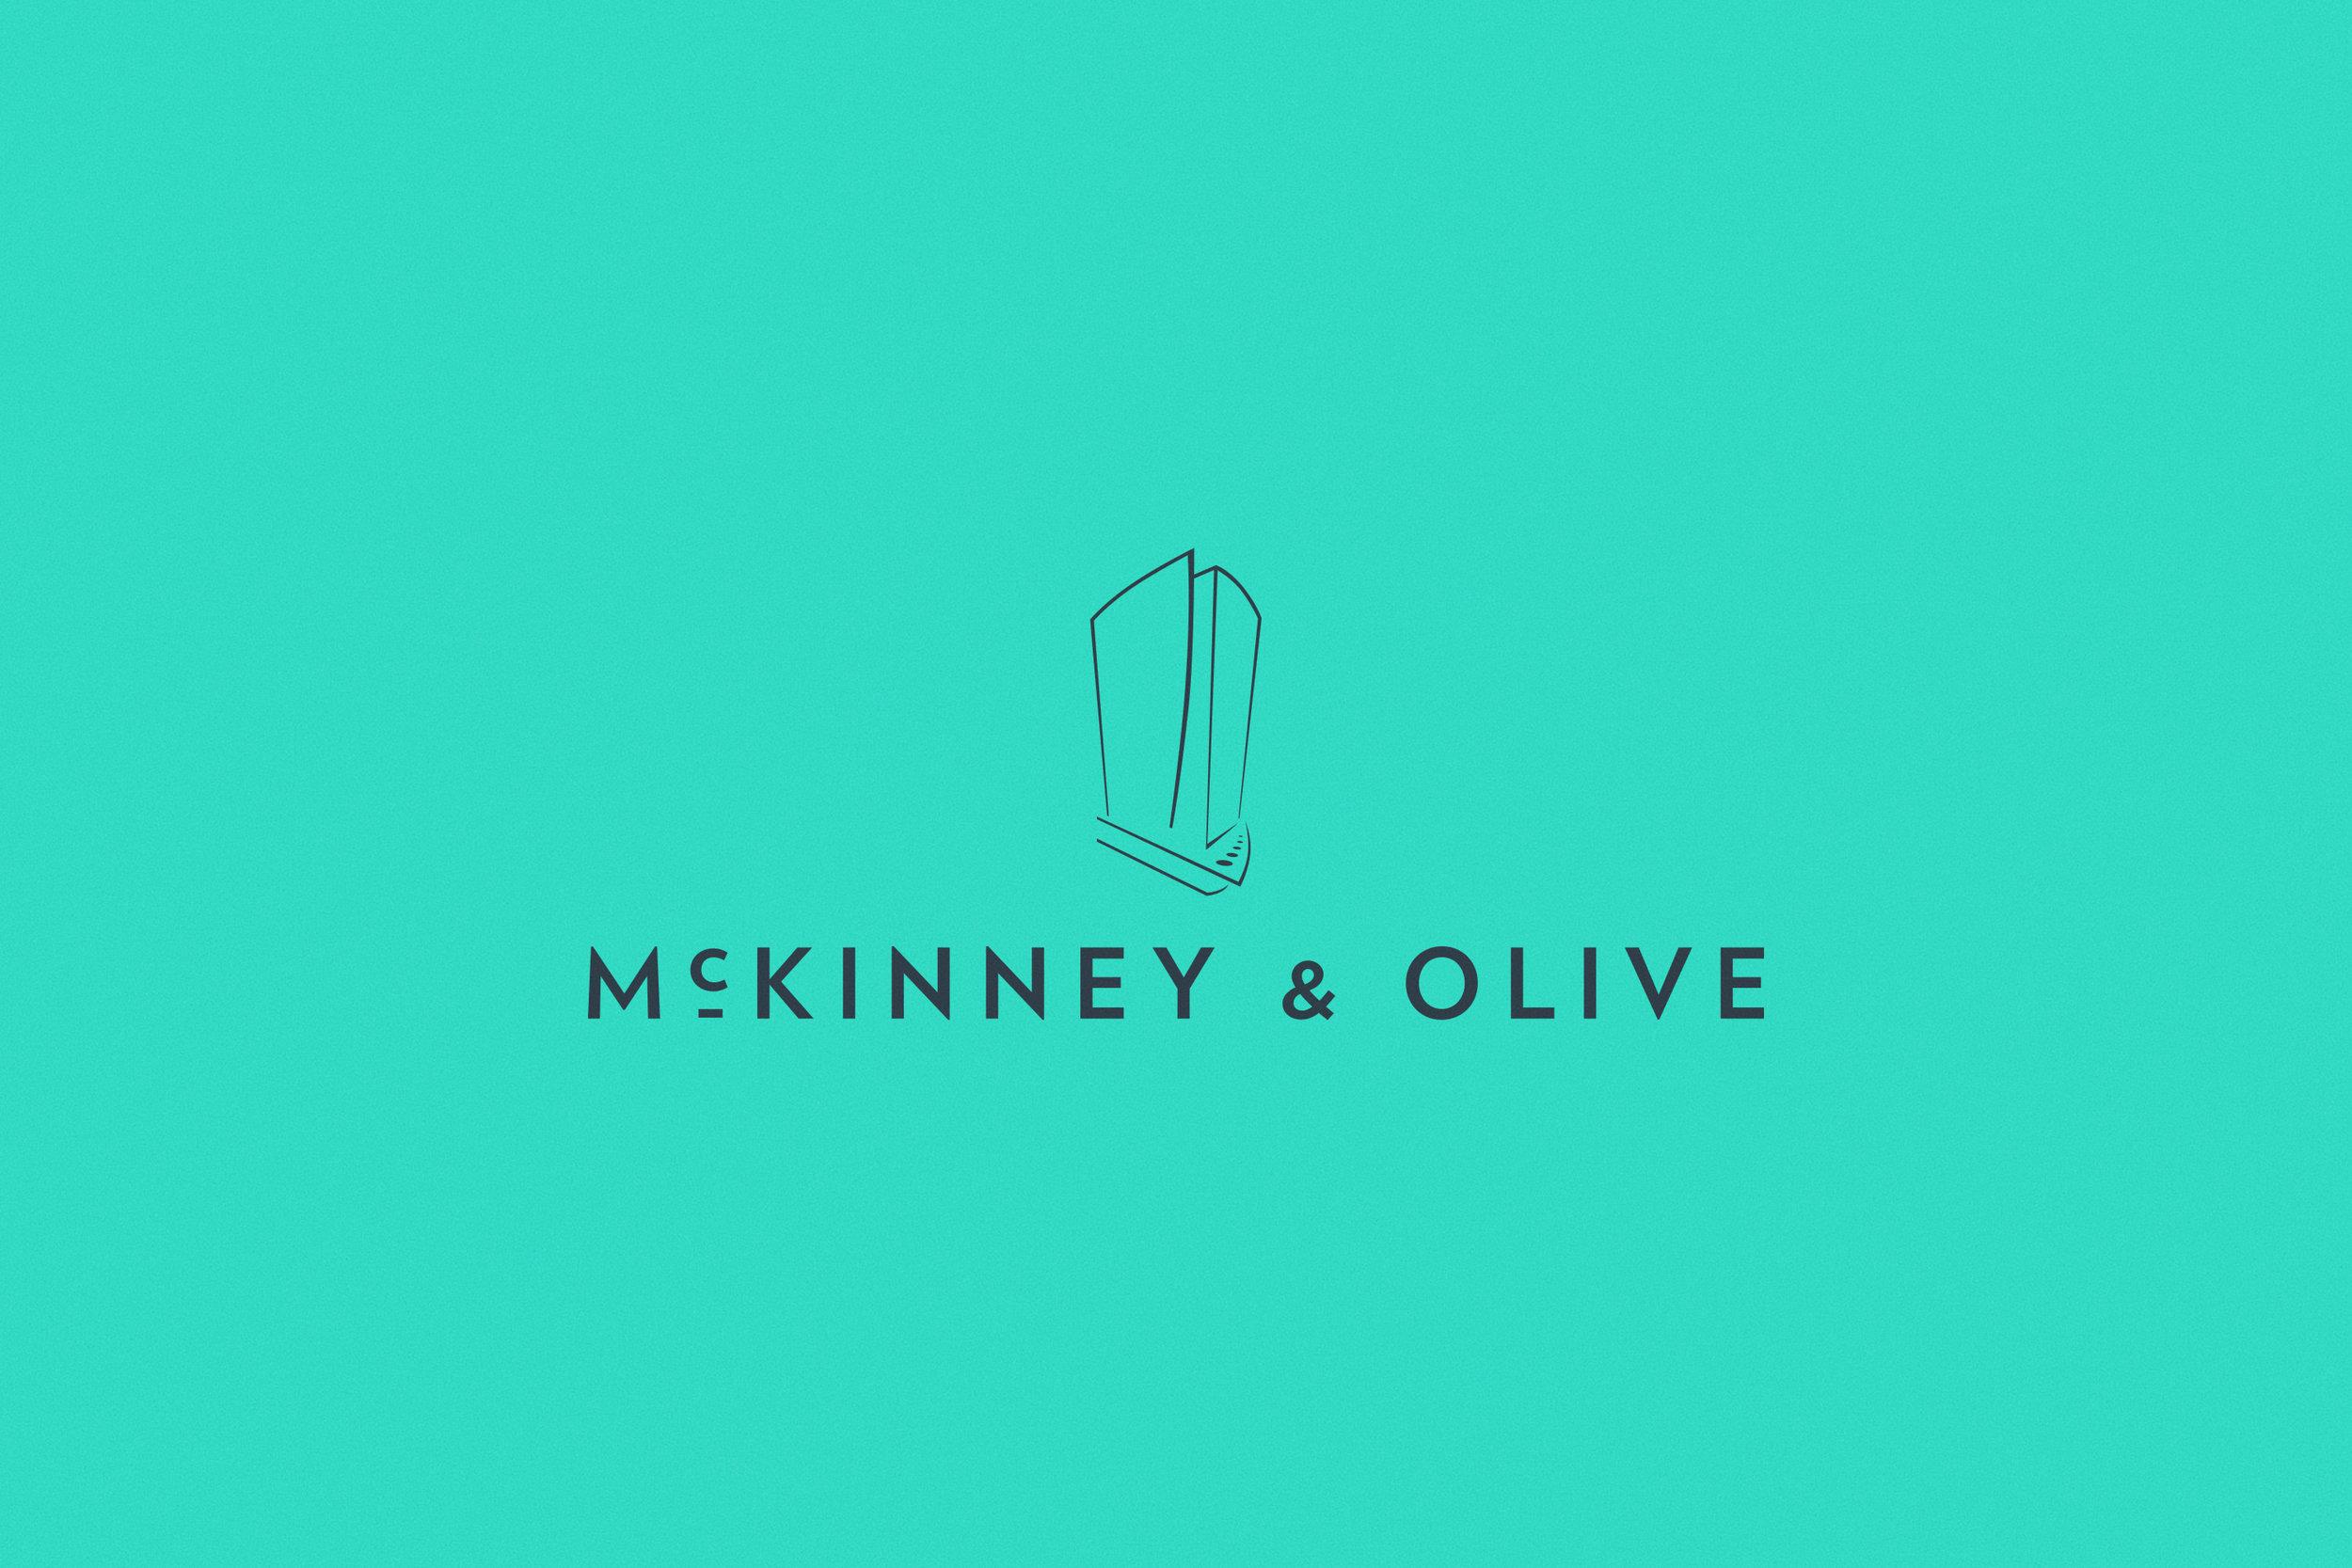 ronaldvillegas-mckinney-and-olive-logo-vertical.jpg